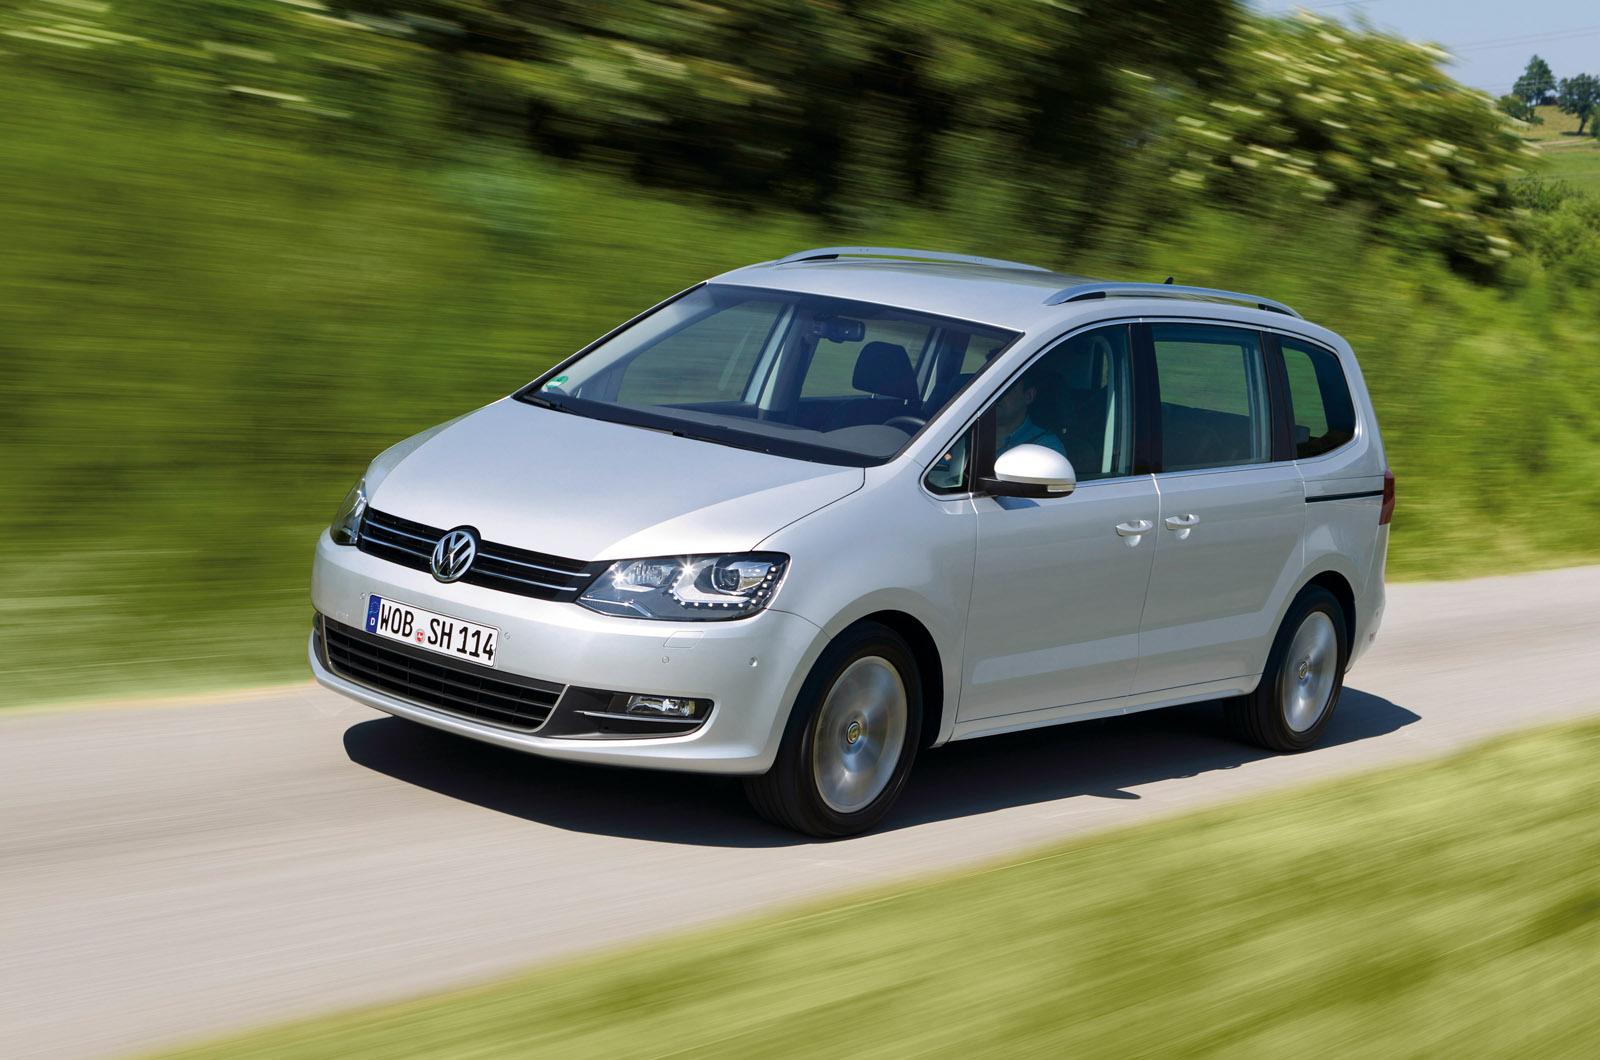 VW Sharan performance